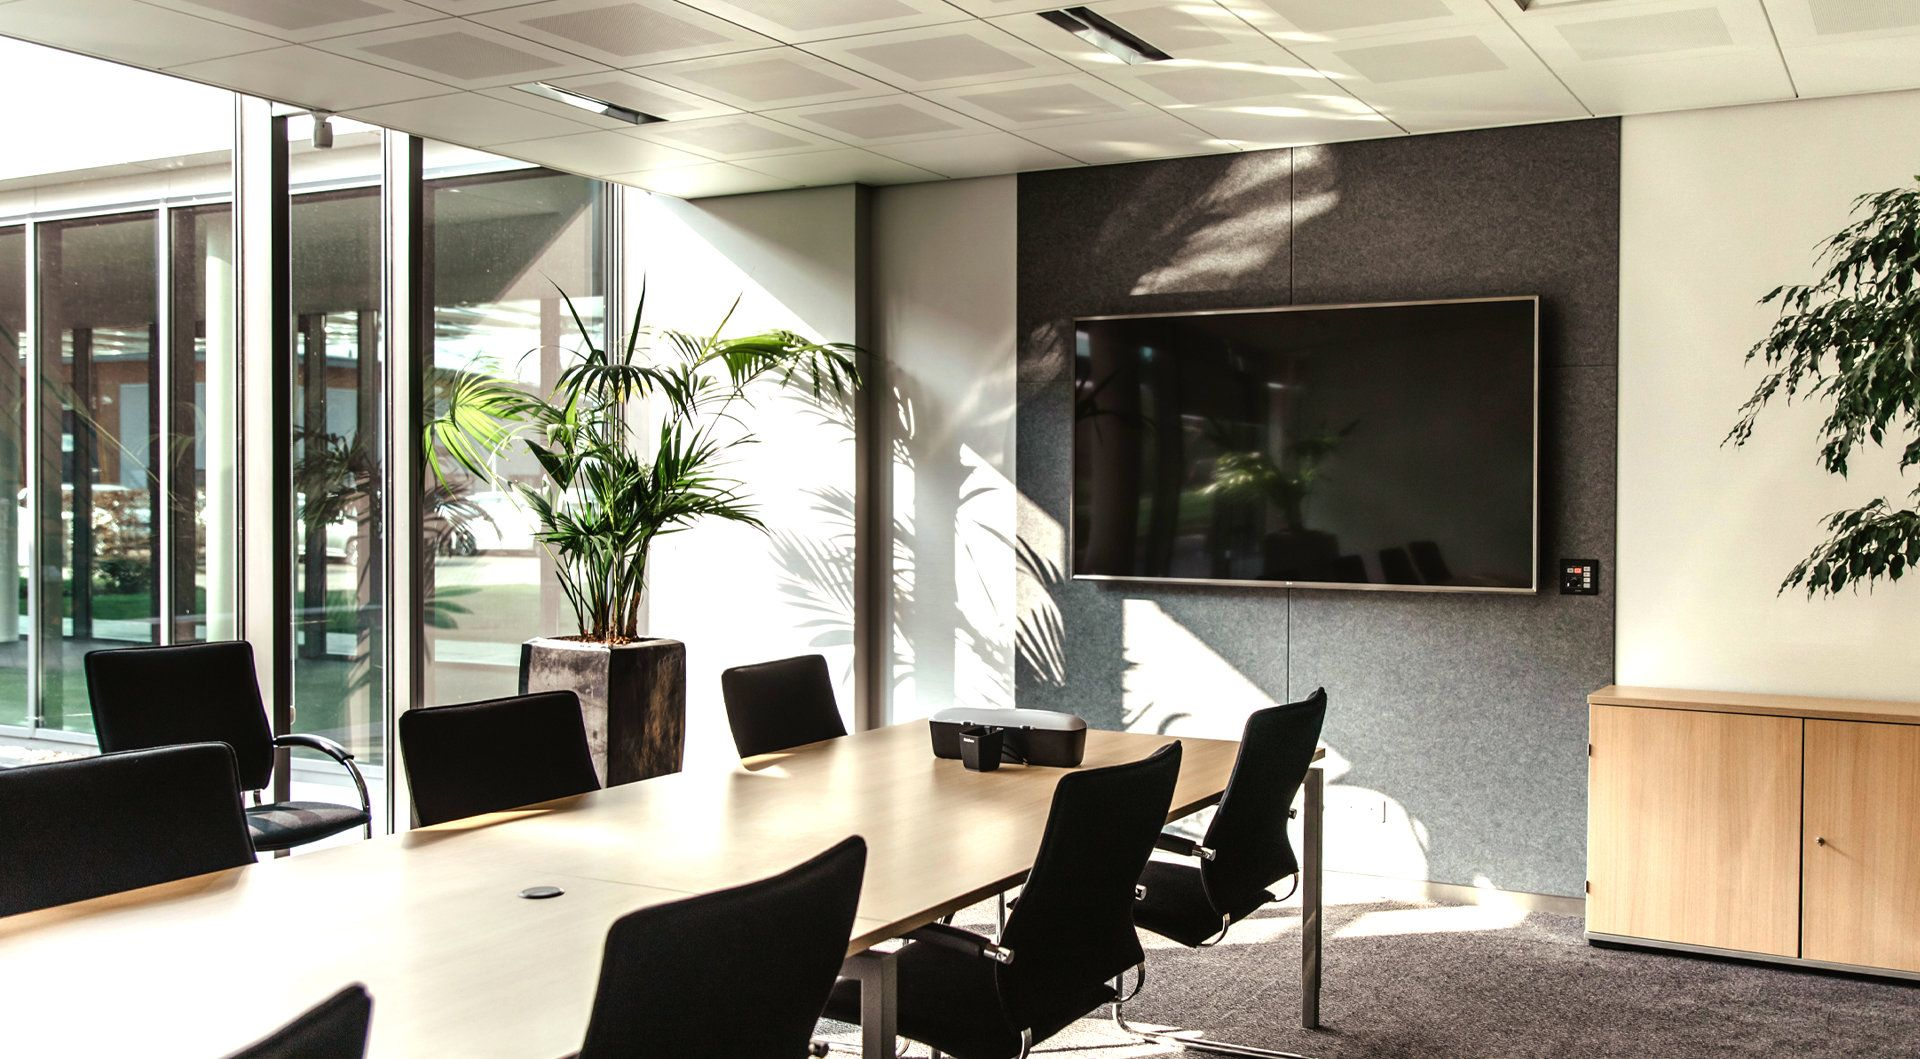 Epson EB-W51 beamer/projector Desktopprojector 4000 ANSI lumens 3LCD WXGA (1280x800) Wit - Case studie de vries